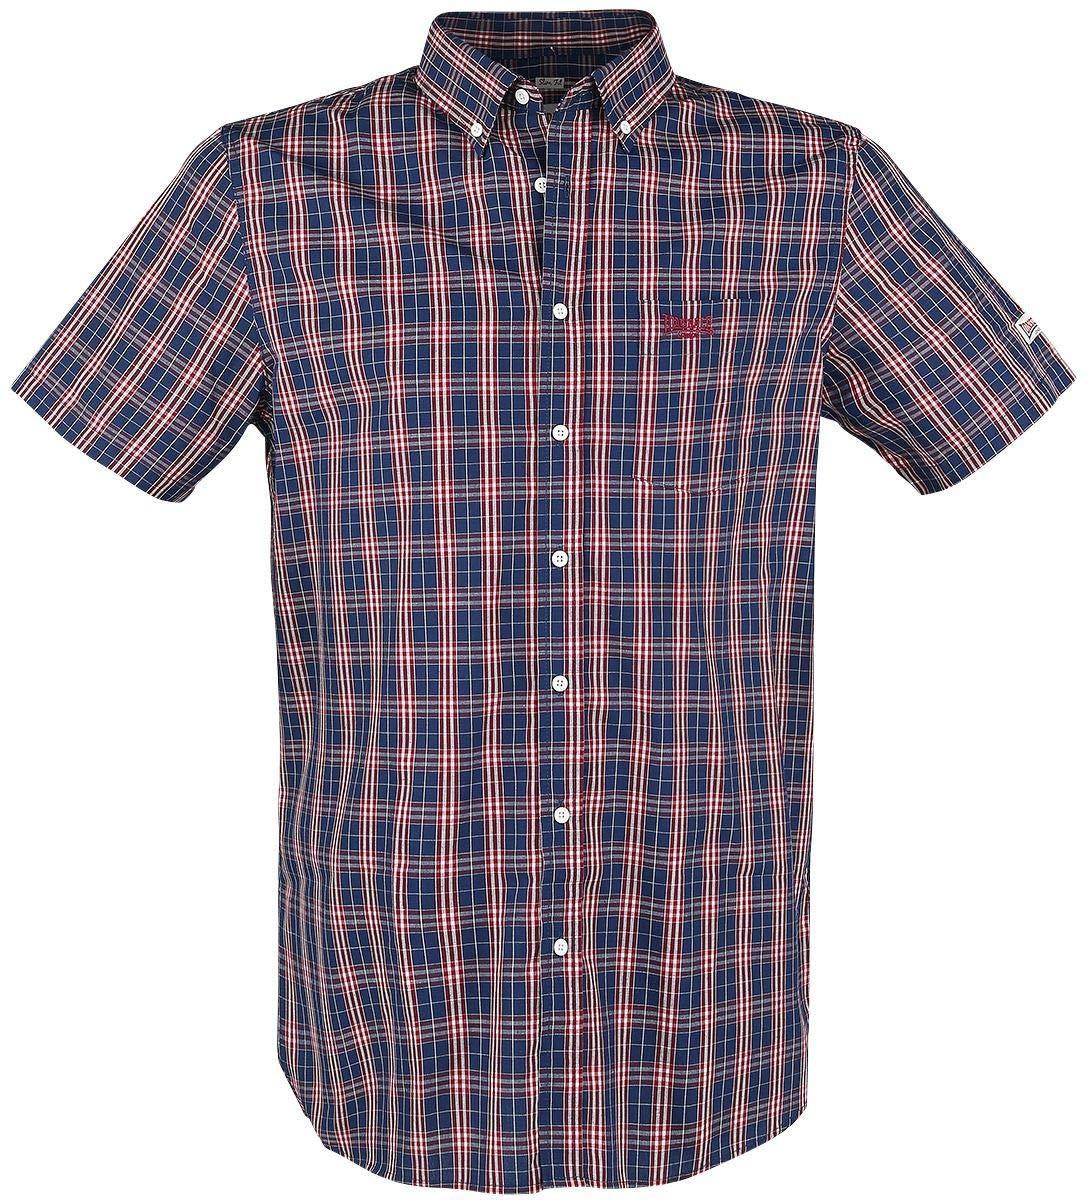 TALLA L. Lonsdale London Brixworth - Camiseta de Manga Corta para Hombre